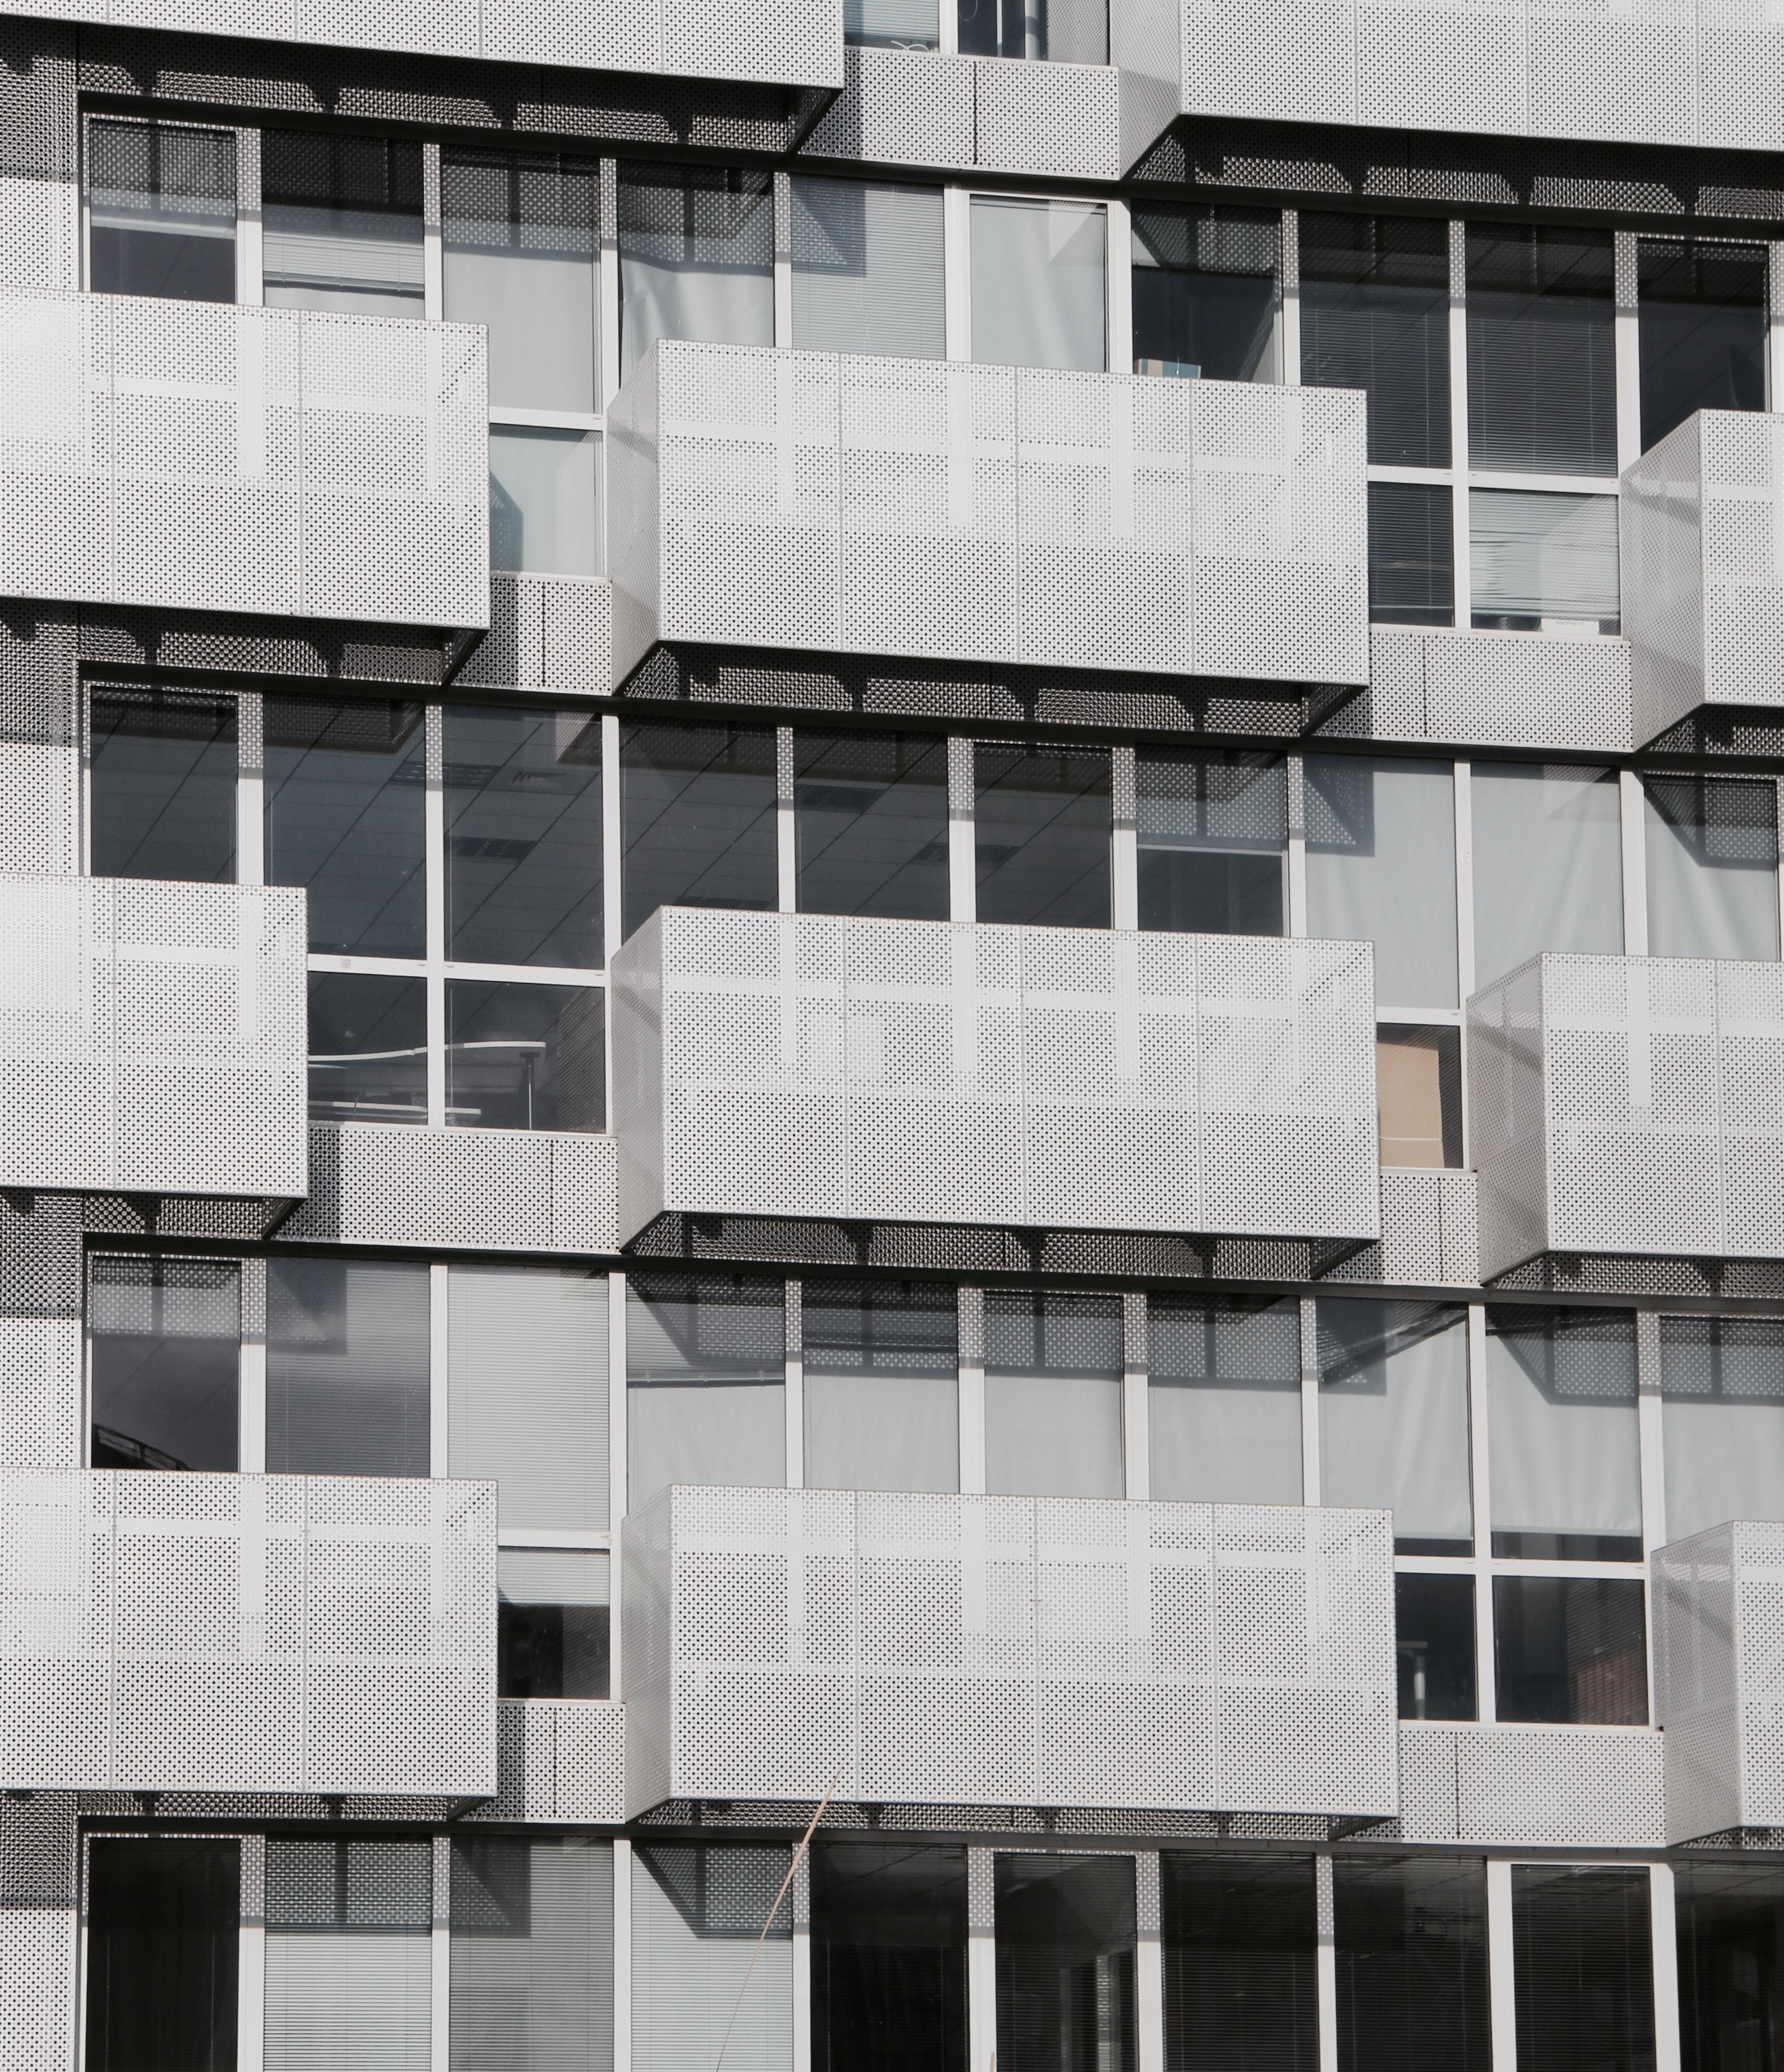 closeup photo of gray concrete building